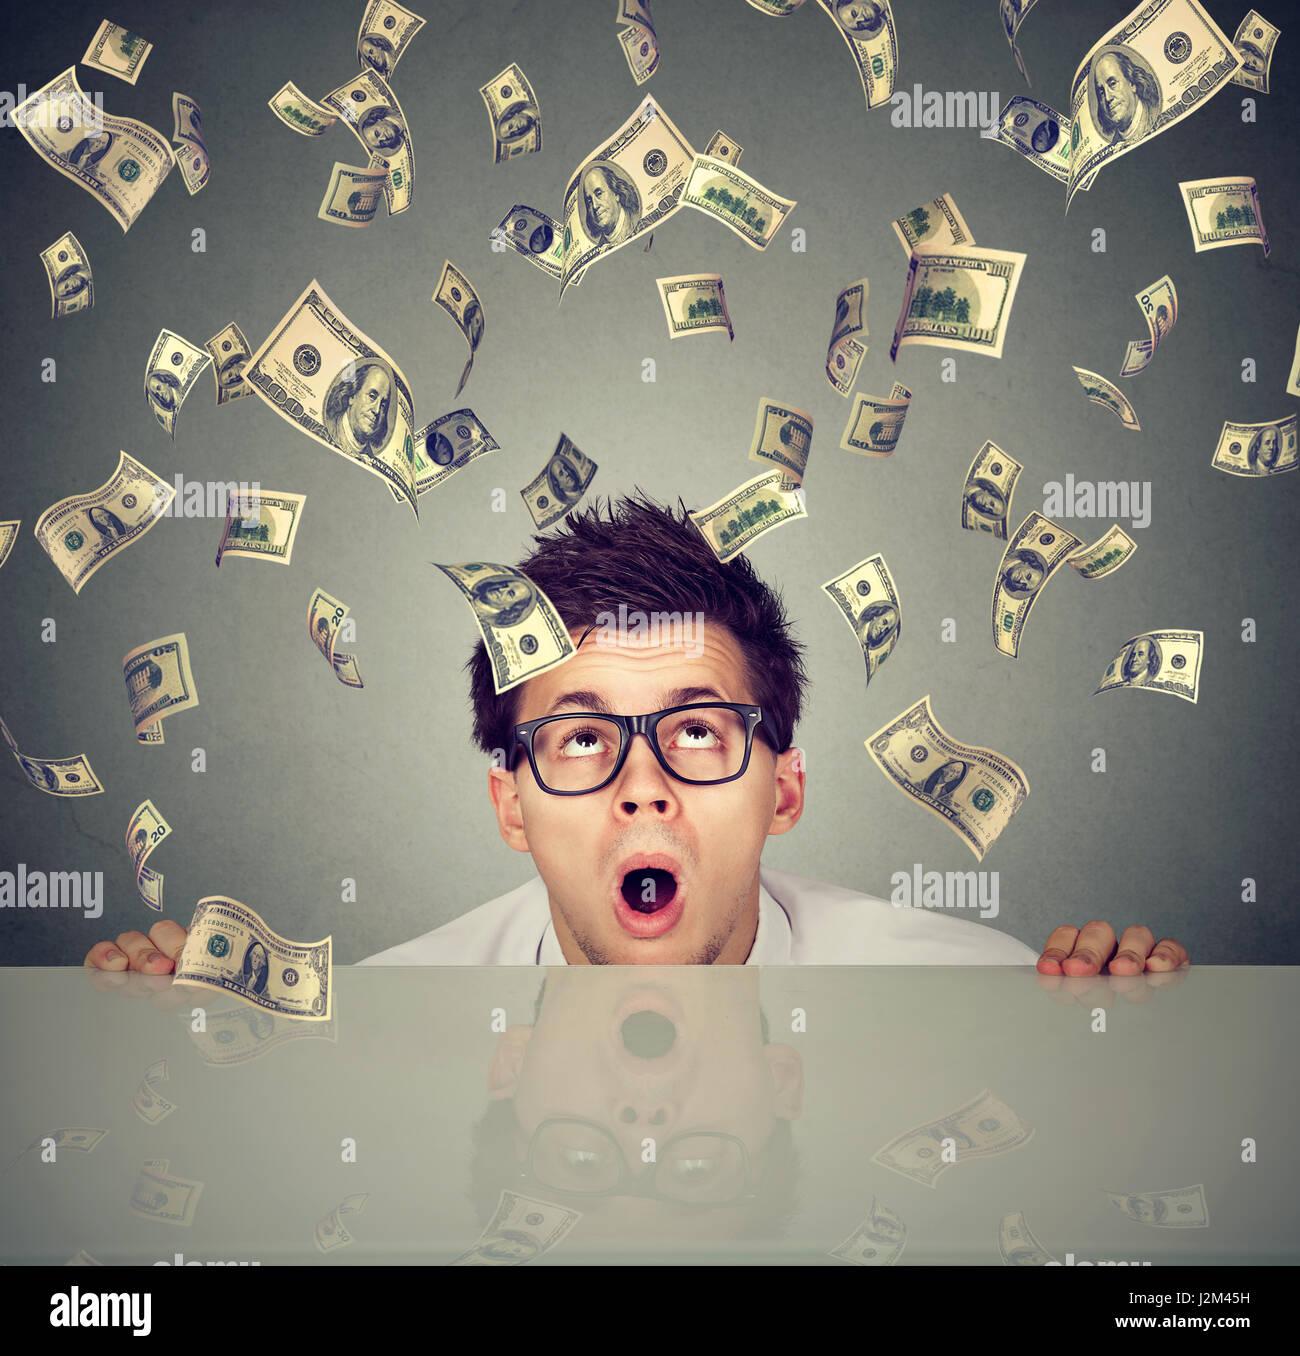 Surprised man under money rain peeking from under the table - Stock Image